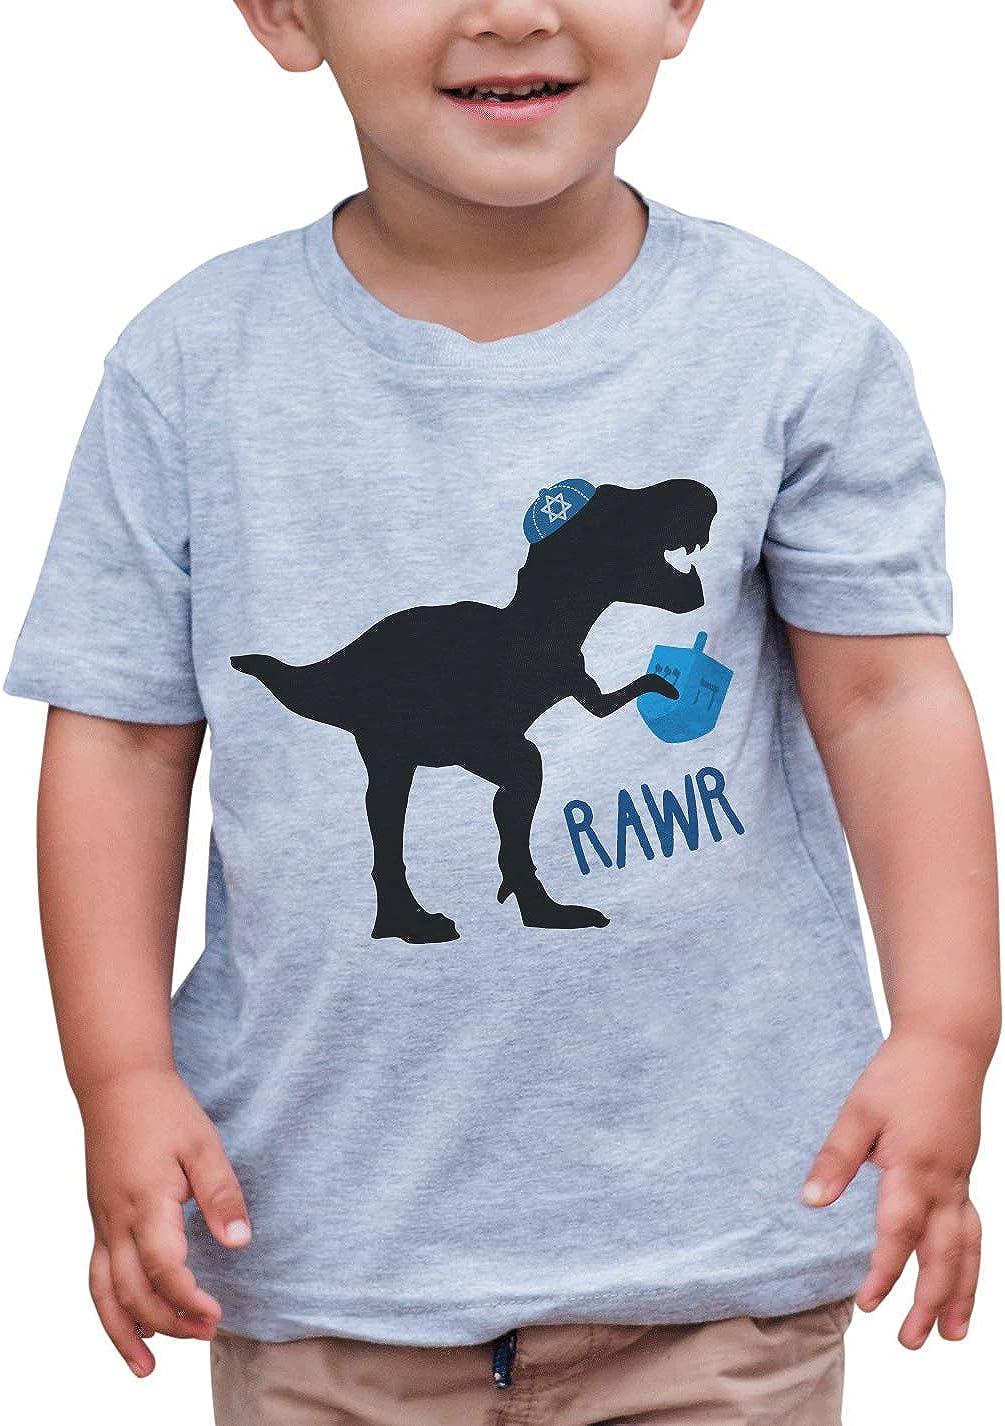 7 ate 9 Apparel Kids Funny Dinosaur Hanukkah T-Shirt